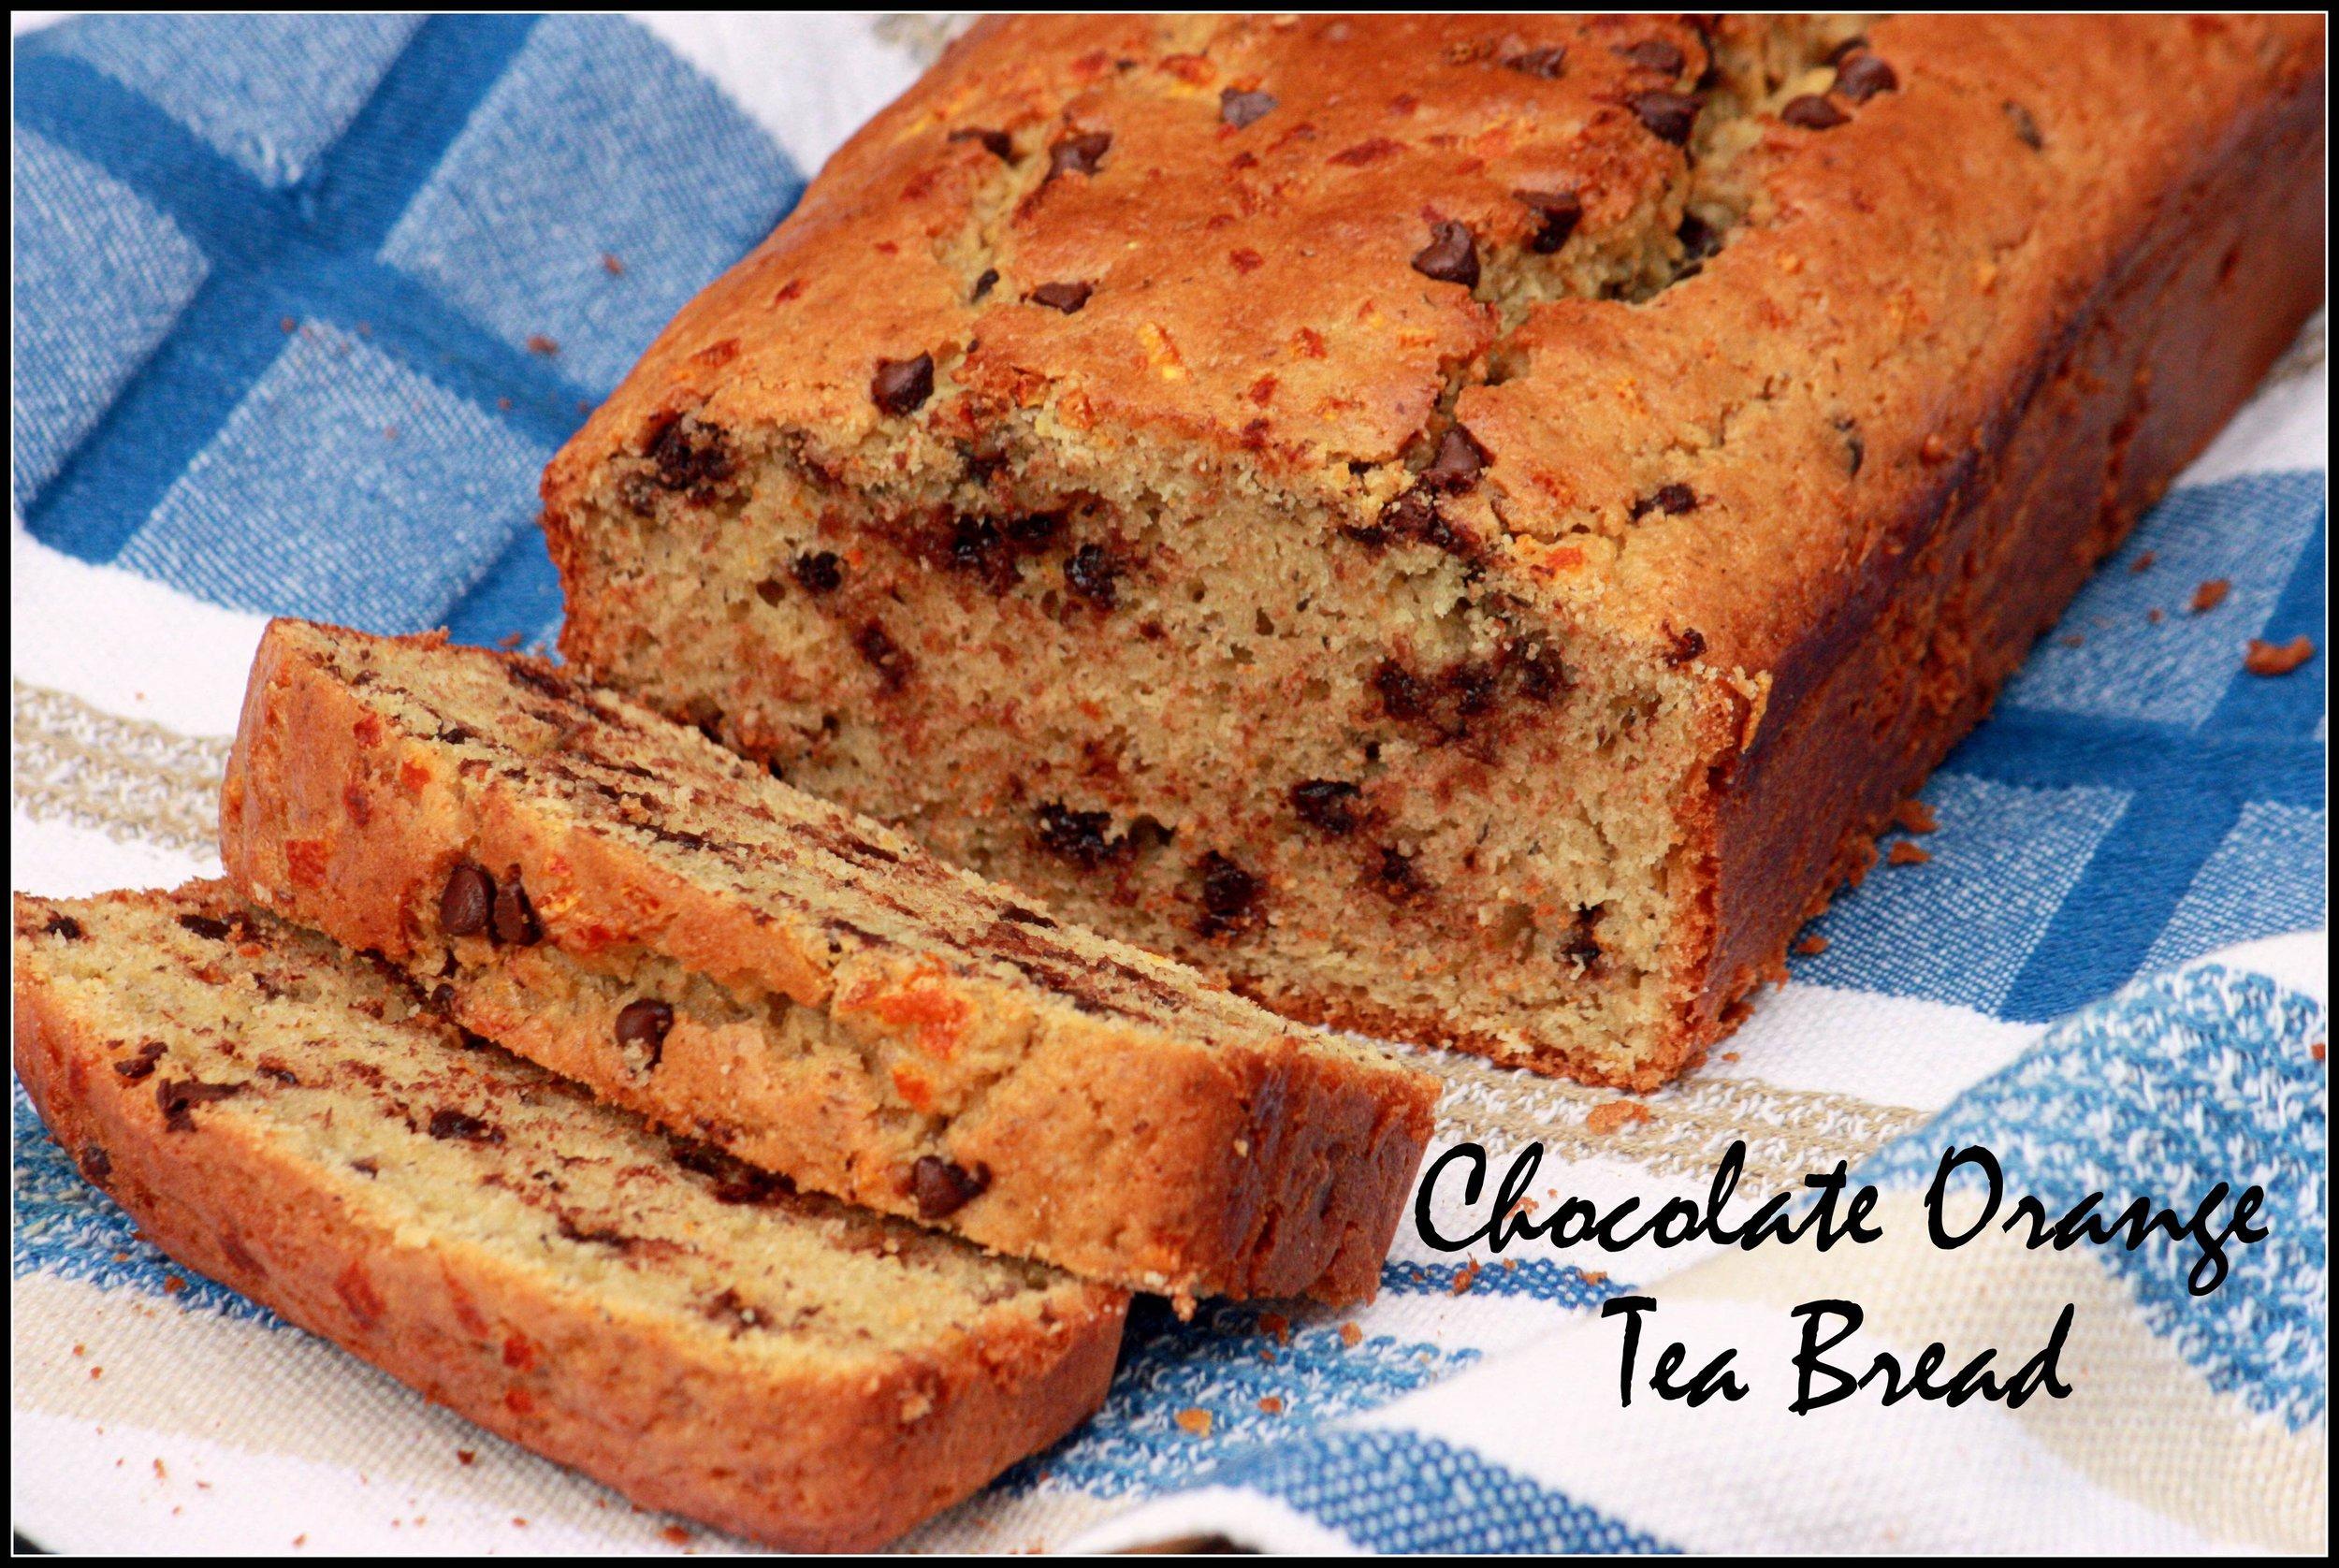 Chocolate Orange Tea Bread